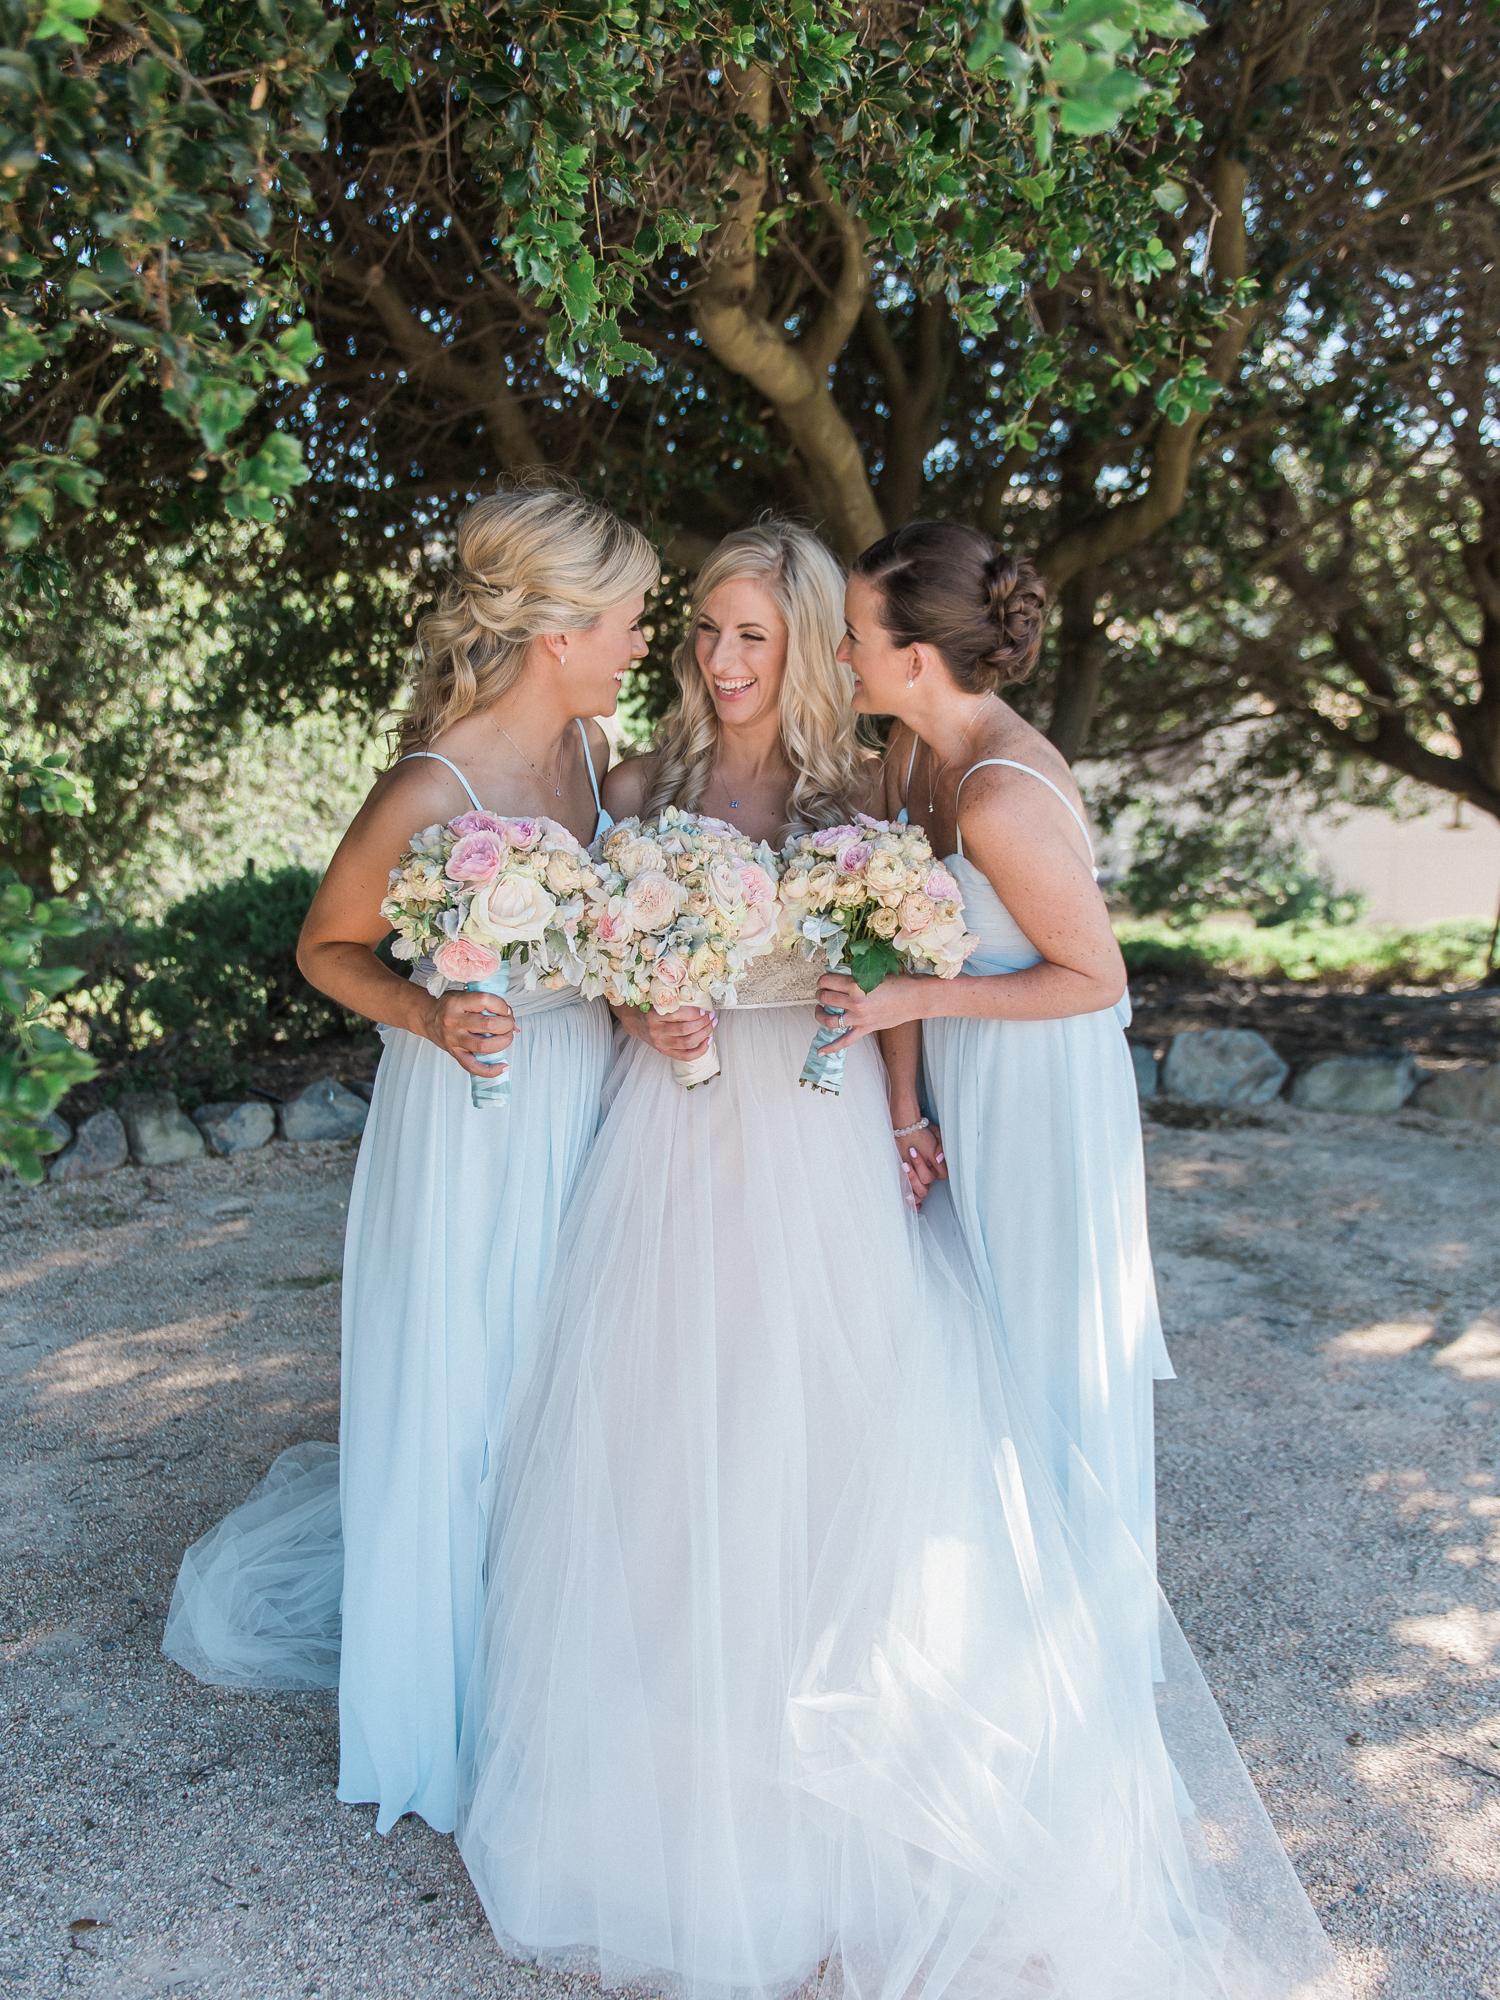 Aimee+Logan_wedding_spp-65.jpg